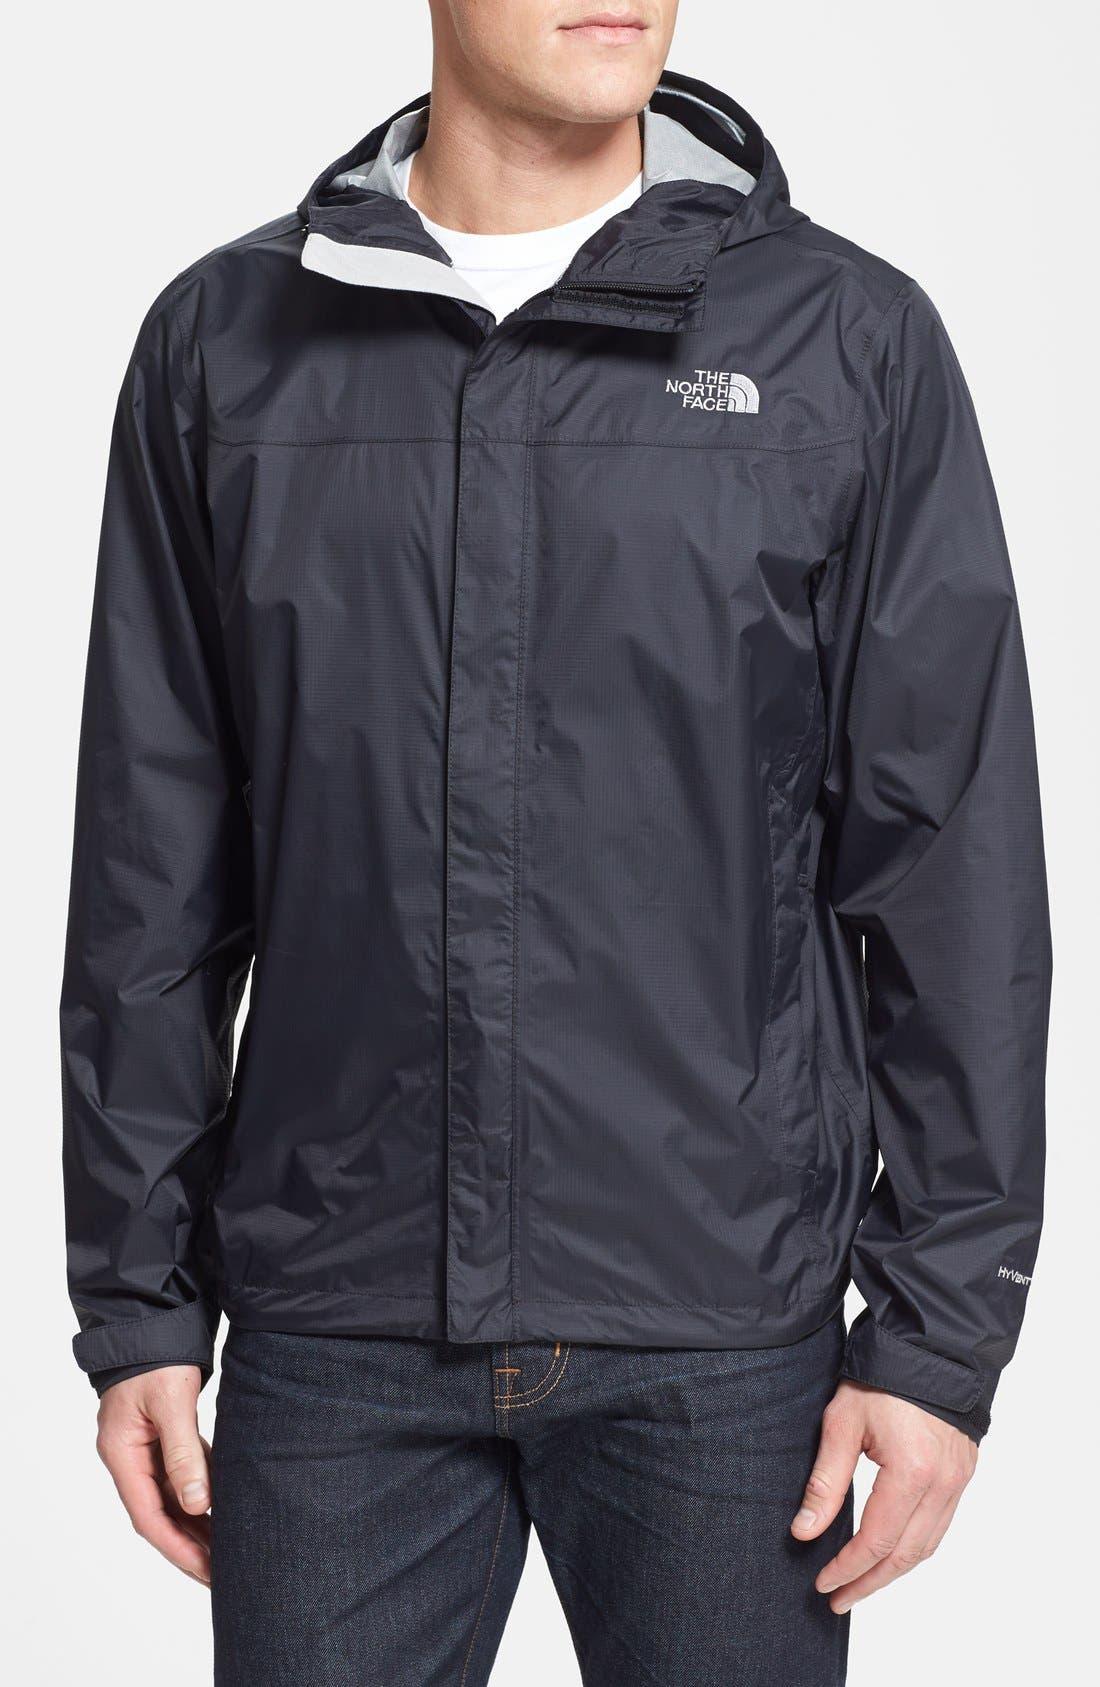 THE NORTH FACE,                             Venture Waterproof Jacket,                             Main thumbnail 1, color,                             001